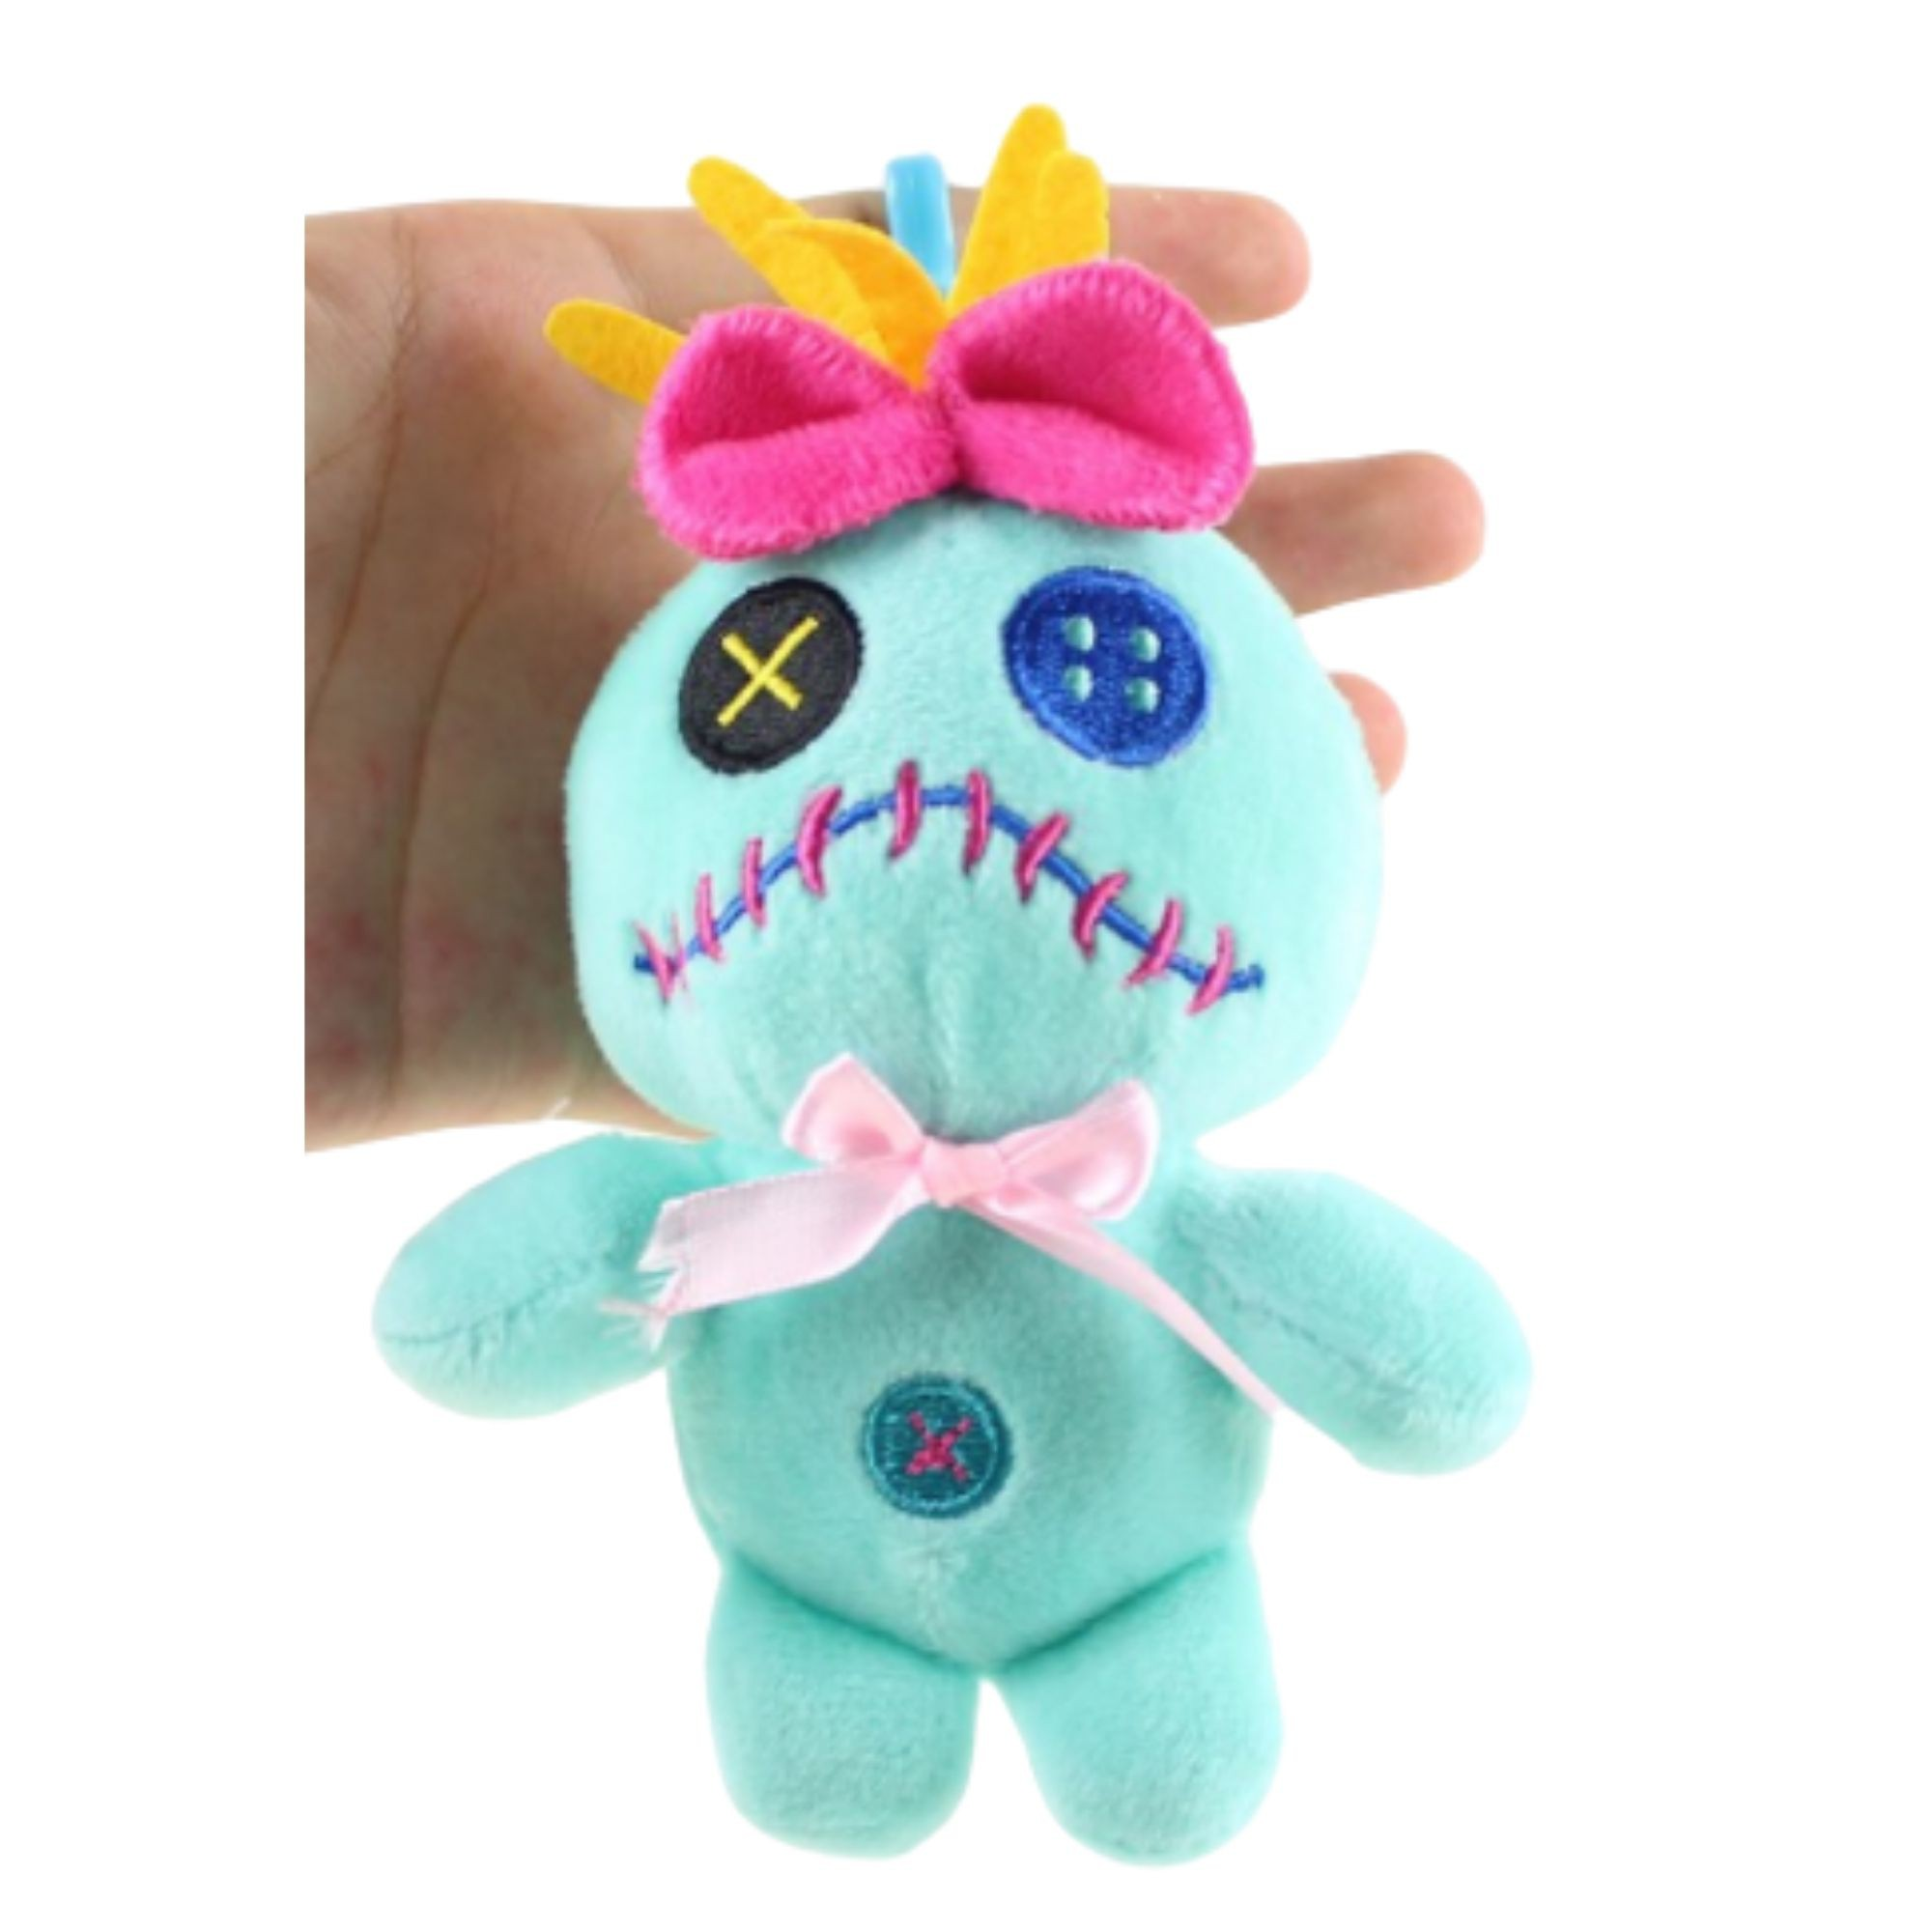 Pelucia Boneca Xepa Scrump do filme  Lilo Stitch Disney  - Game Land Brinquedos